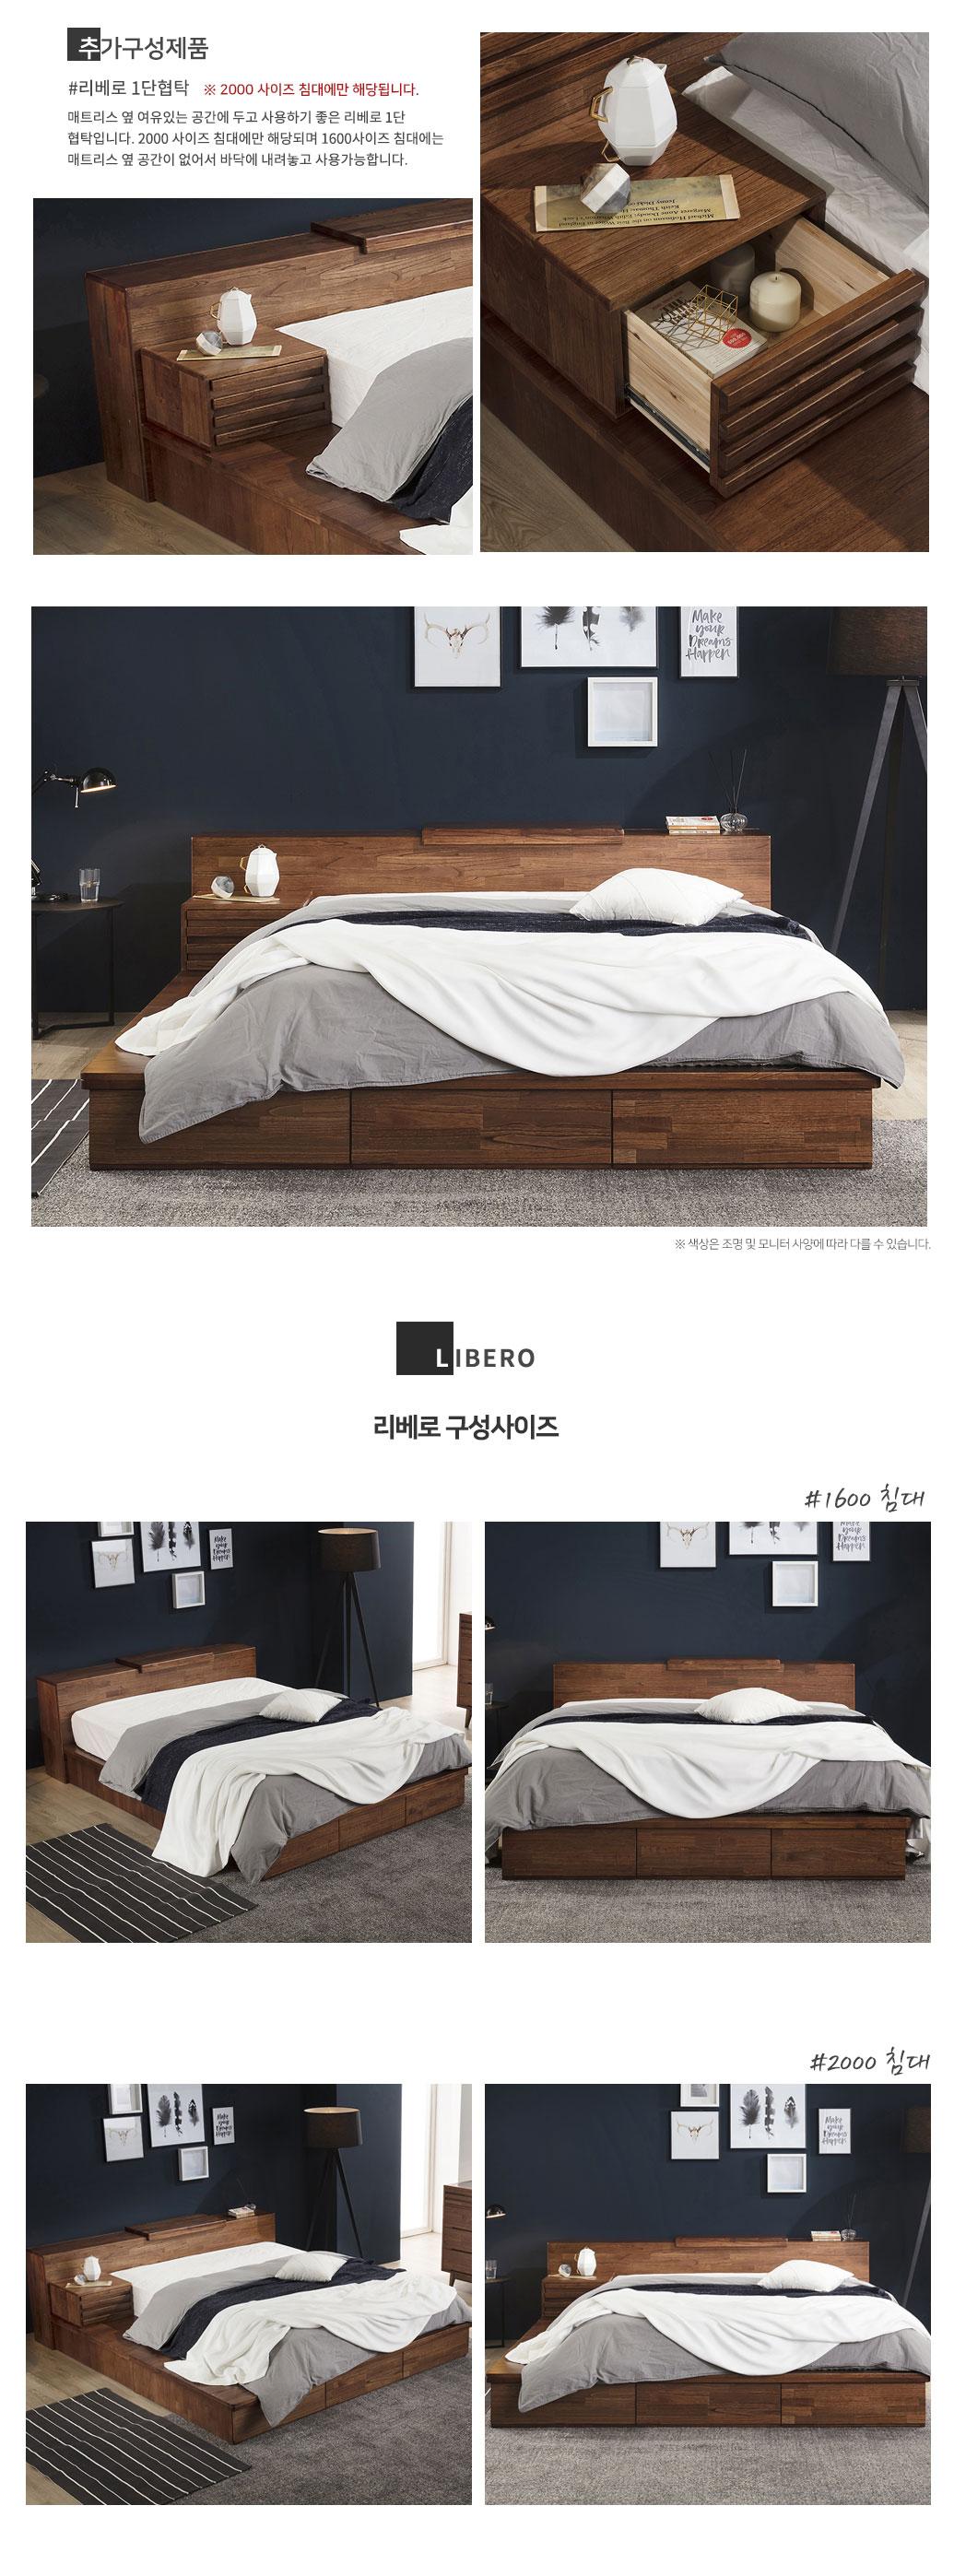 libero_bed_06.jpg